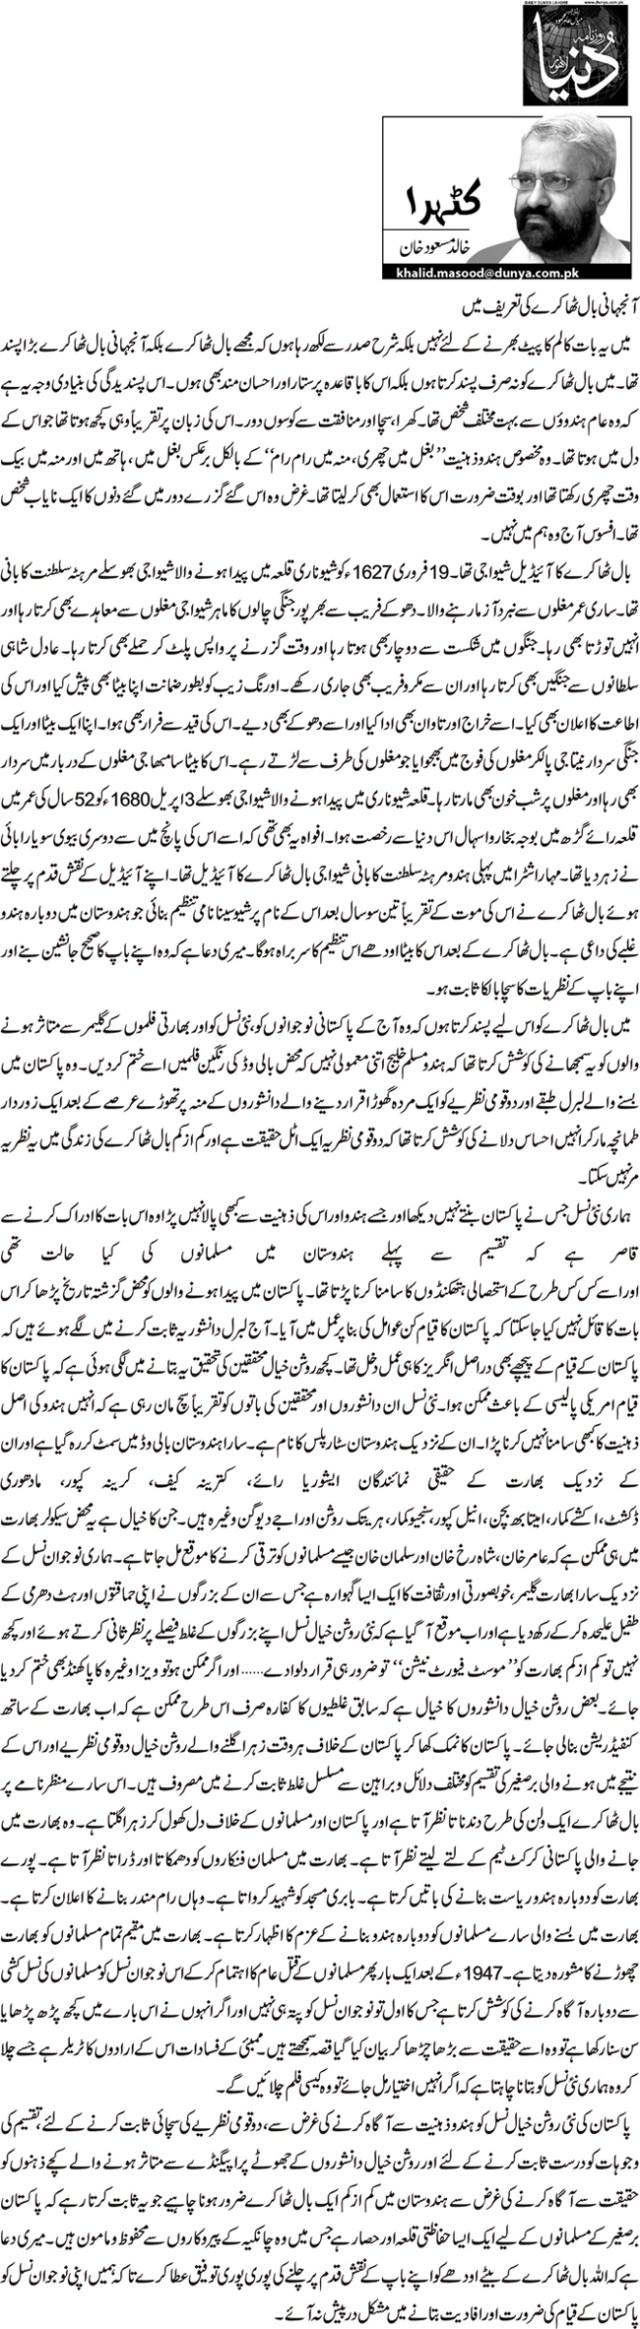 Aanjahani Ball Thakray ki tareef main - Khalid Masood Khan